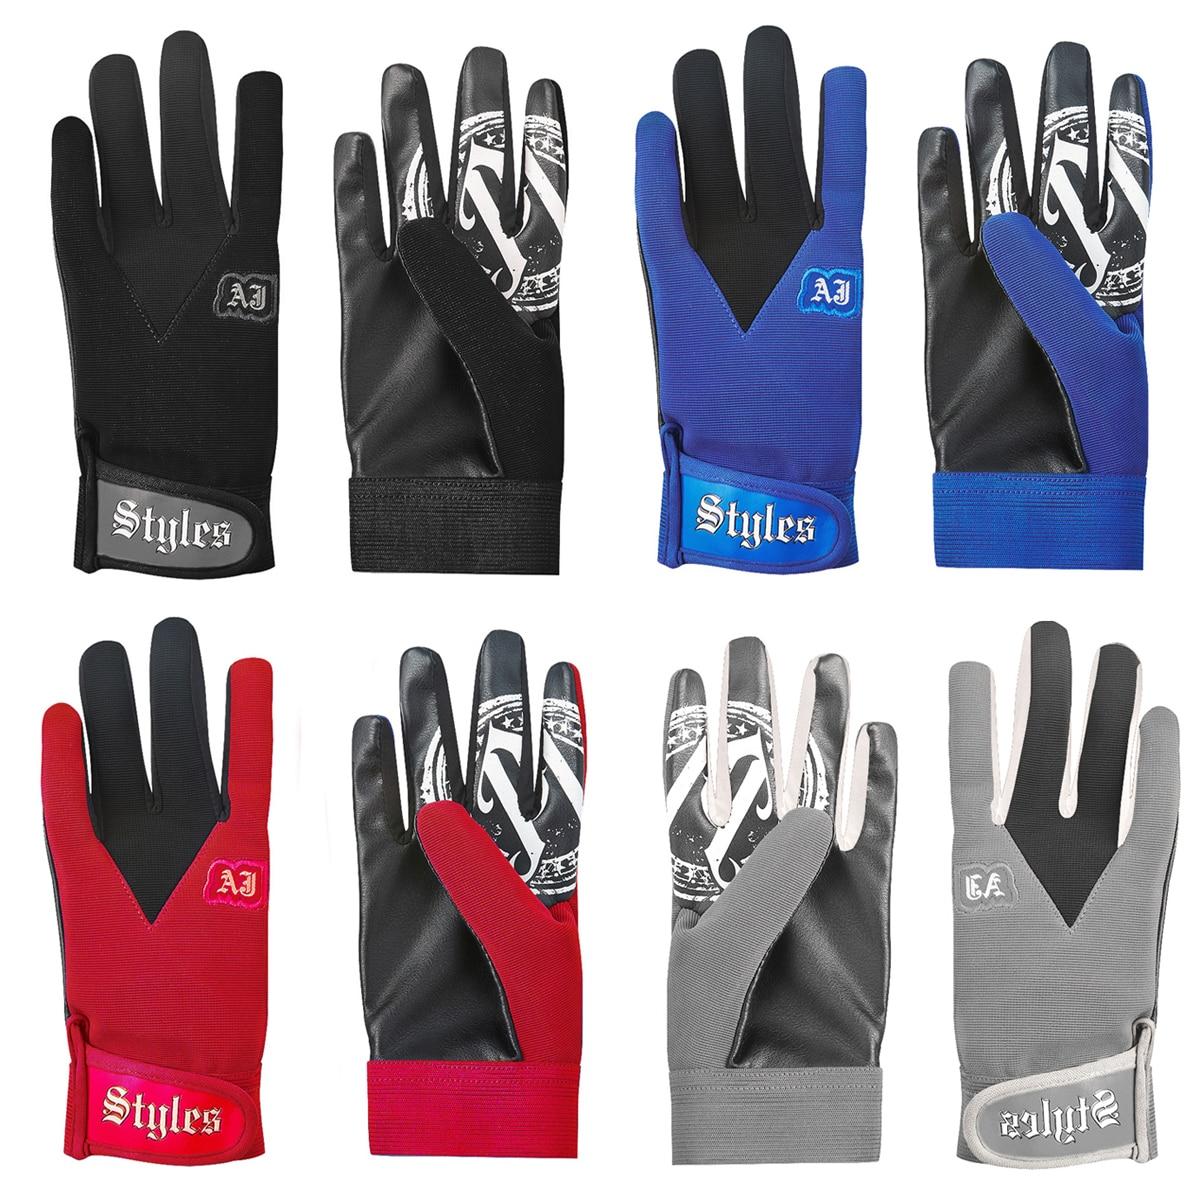 Roman & Reigns AJ Styles Blue / Black / Red / Gray New Blue Pro Wrestling Fight Gloves